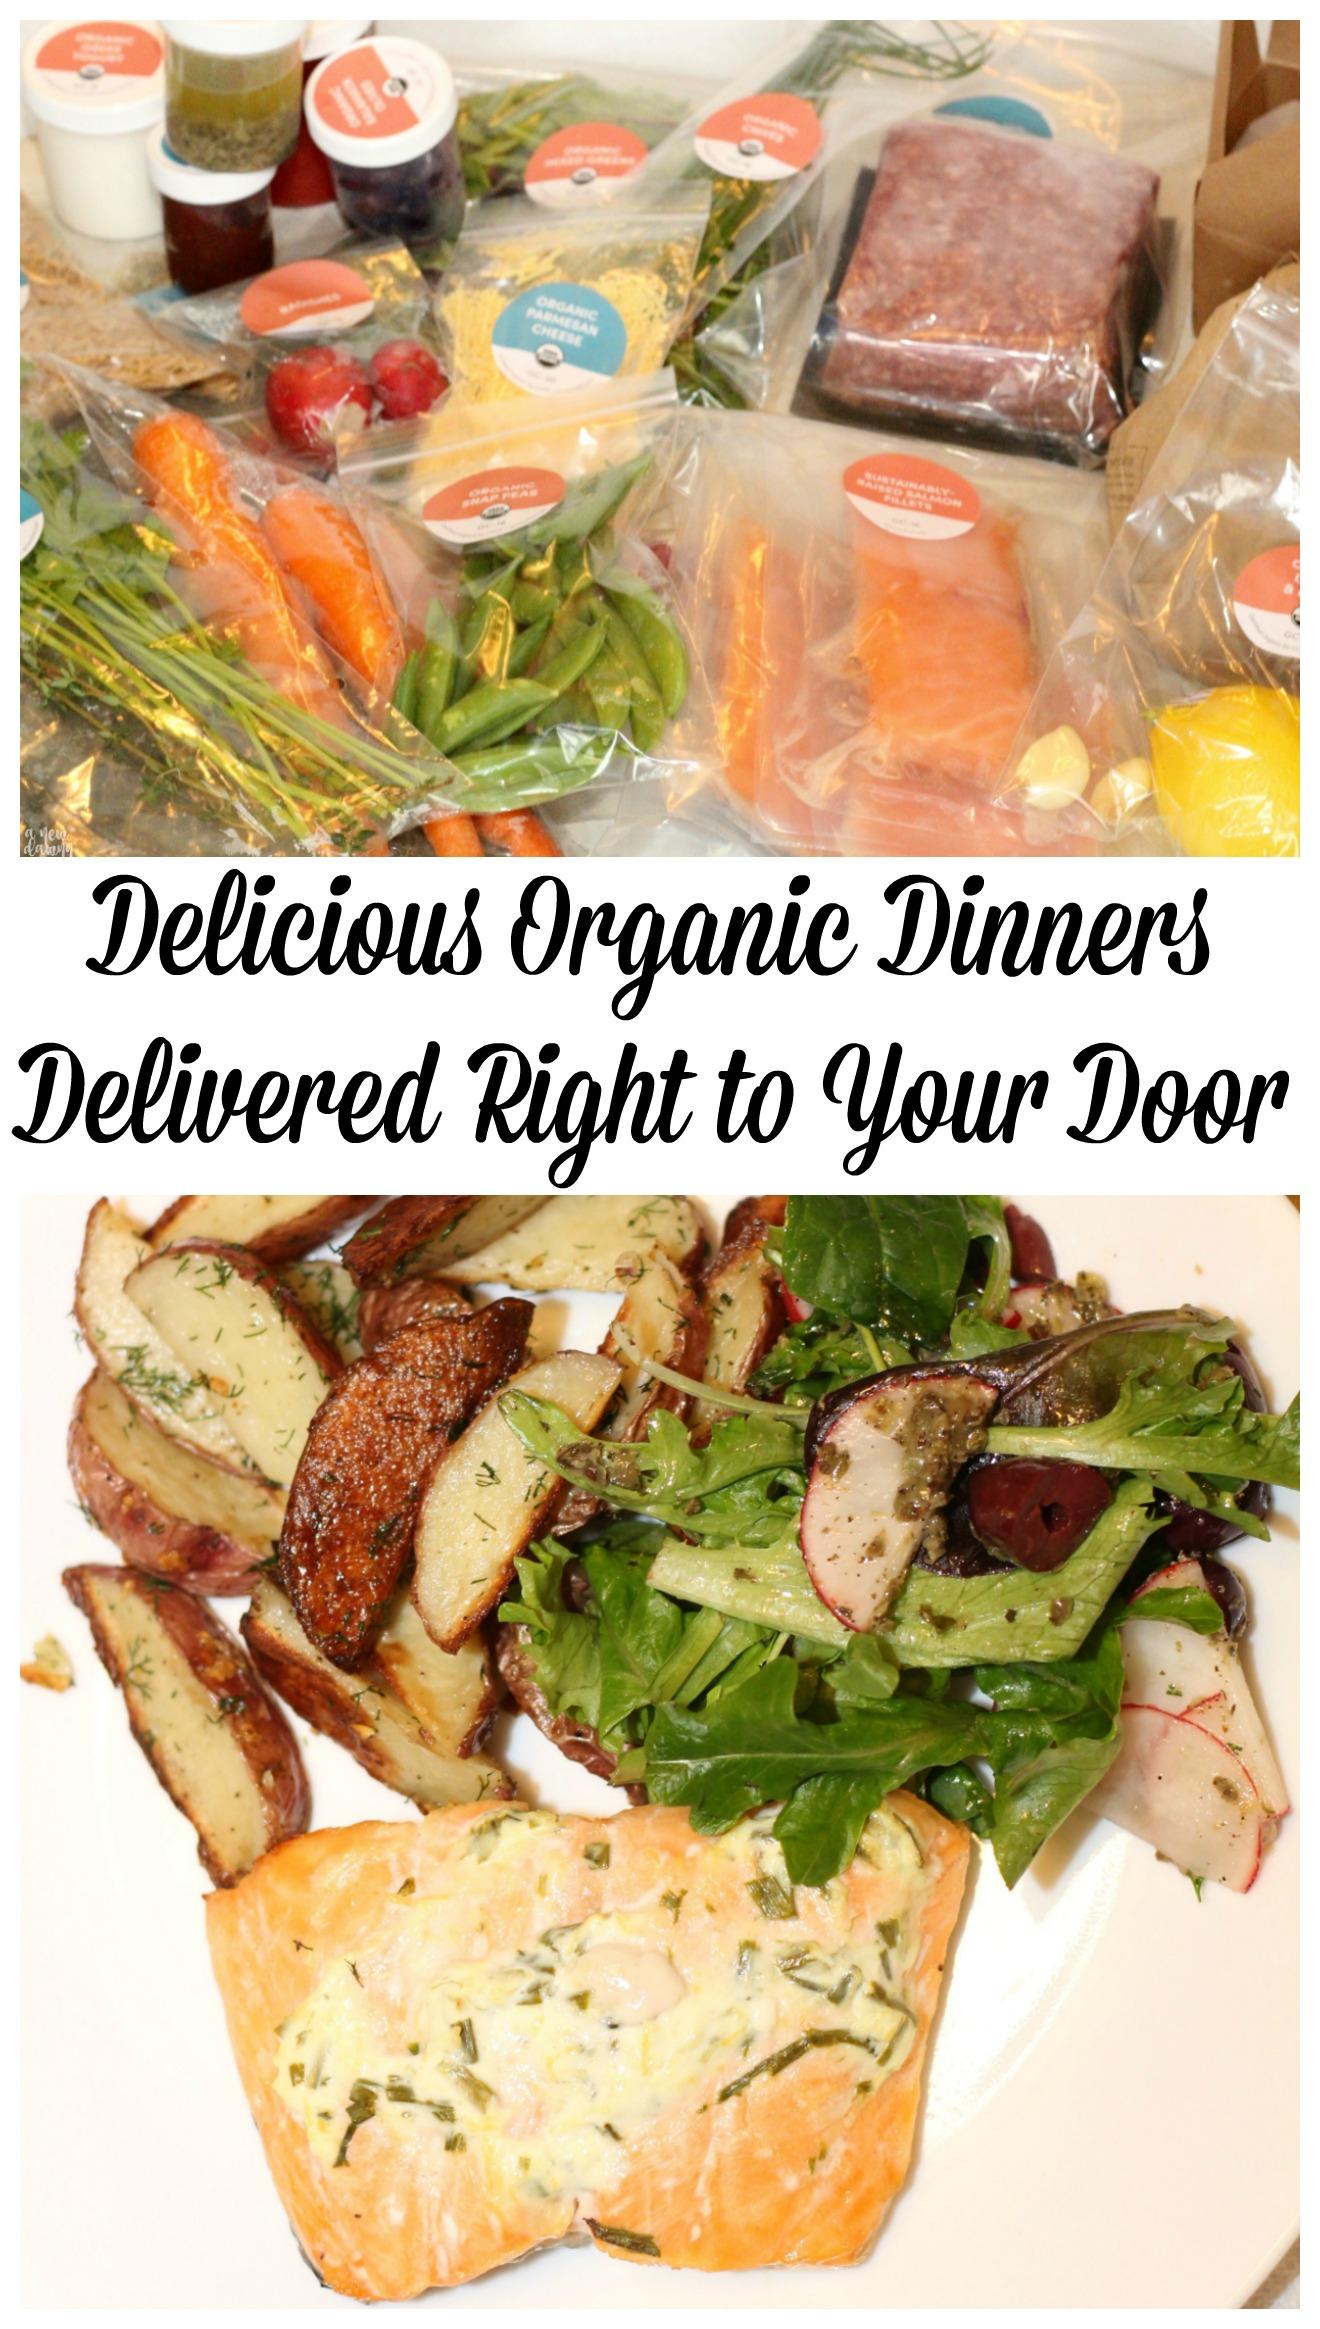 Green Chef Organic Dinners